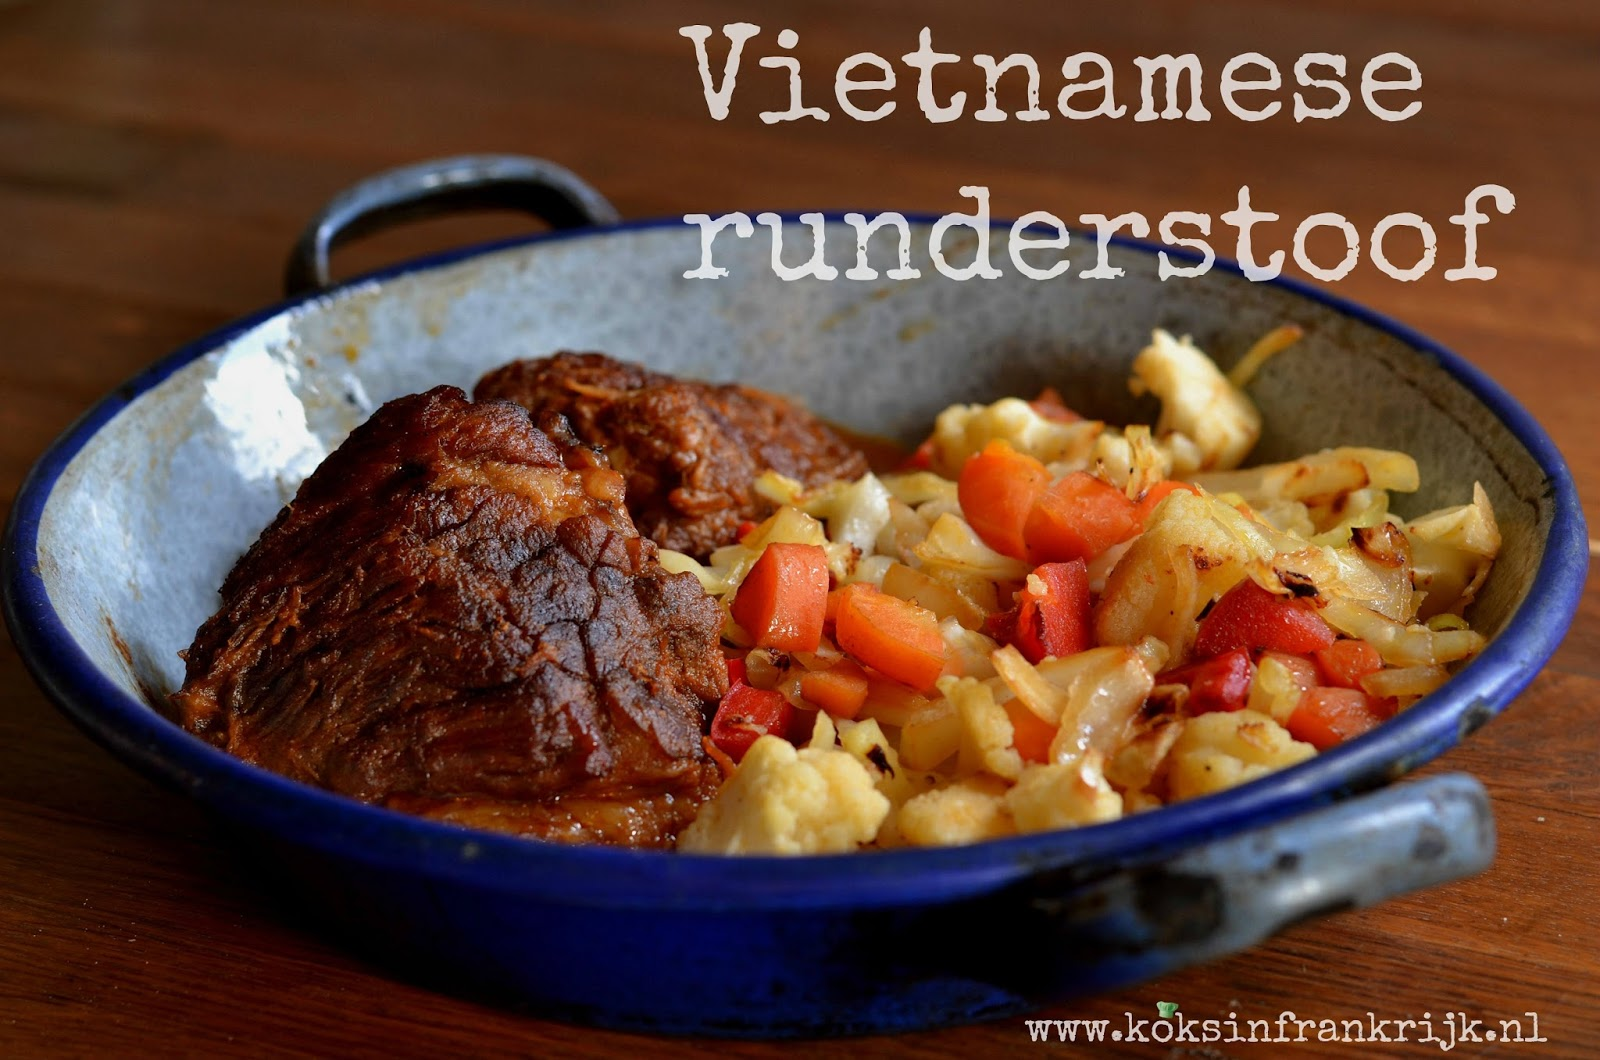 Vietnamese rundvlees stoofpotje (BoKho) - langzaam stoven in de oven of slowcooker